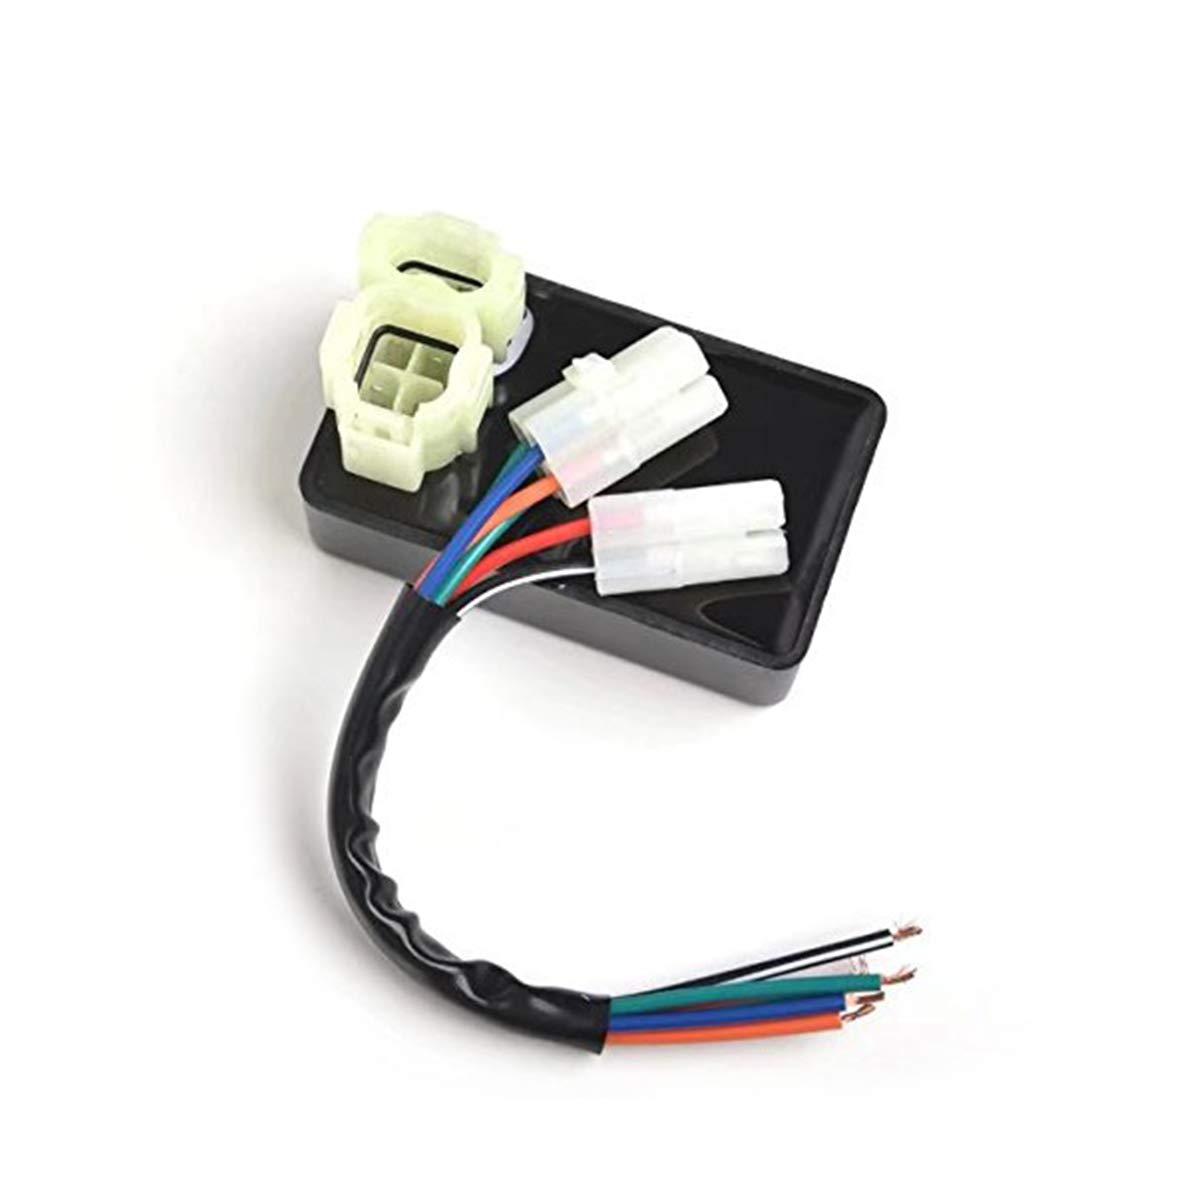 New CDI Module Fits for Honda TRX300 TRX300FW TRX 300 ATV 1989-1993 Replace #ESP10027 30410-HC4-770 CI564 495861 HAOCHENG